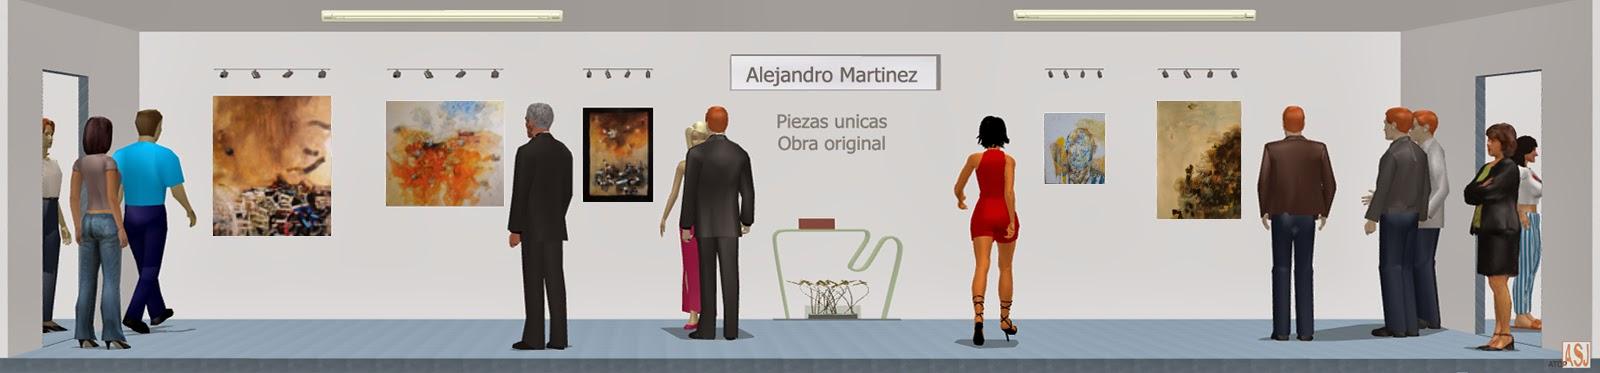 "<img src="" http://1.bp.blogspot.com/-TC2IklCeSb4/Uujwl9VnguI/AAAAAAAAUeY/2s64_kpjVZo/s1600/sala-de-exposicion-de-alejandro-martinez-corredor.jpg "" alt="" sala de exposicion virtual de pinturas de Alejandro Martínez Corredor ""/>"